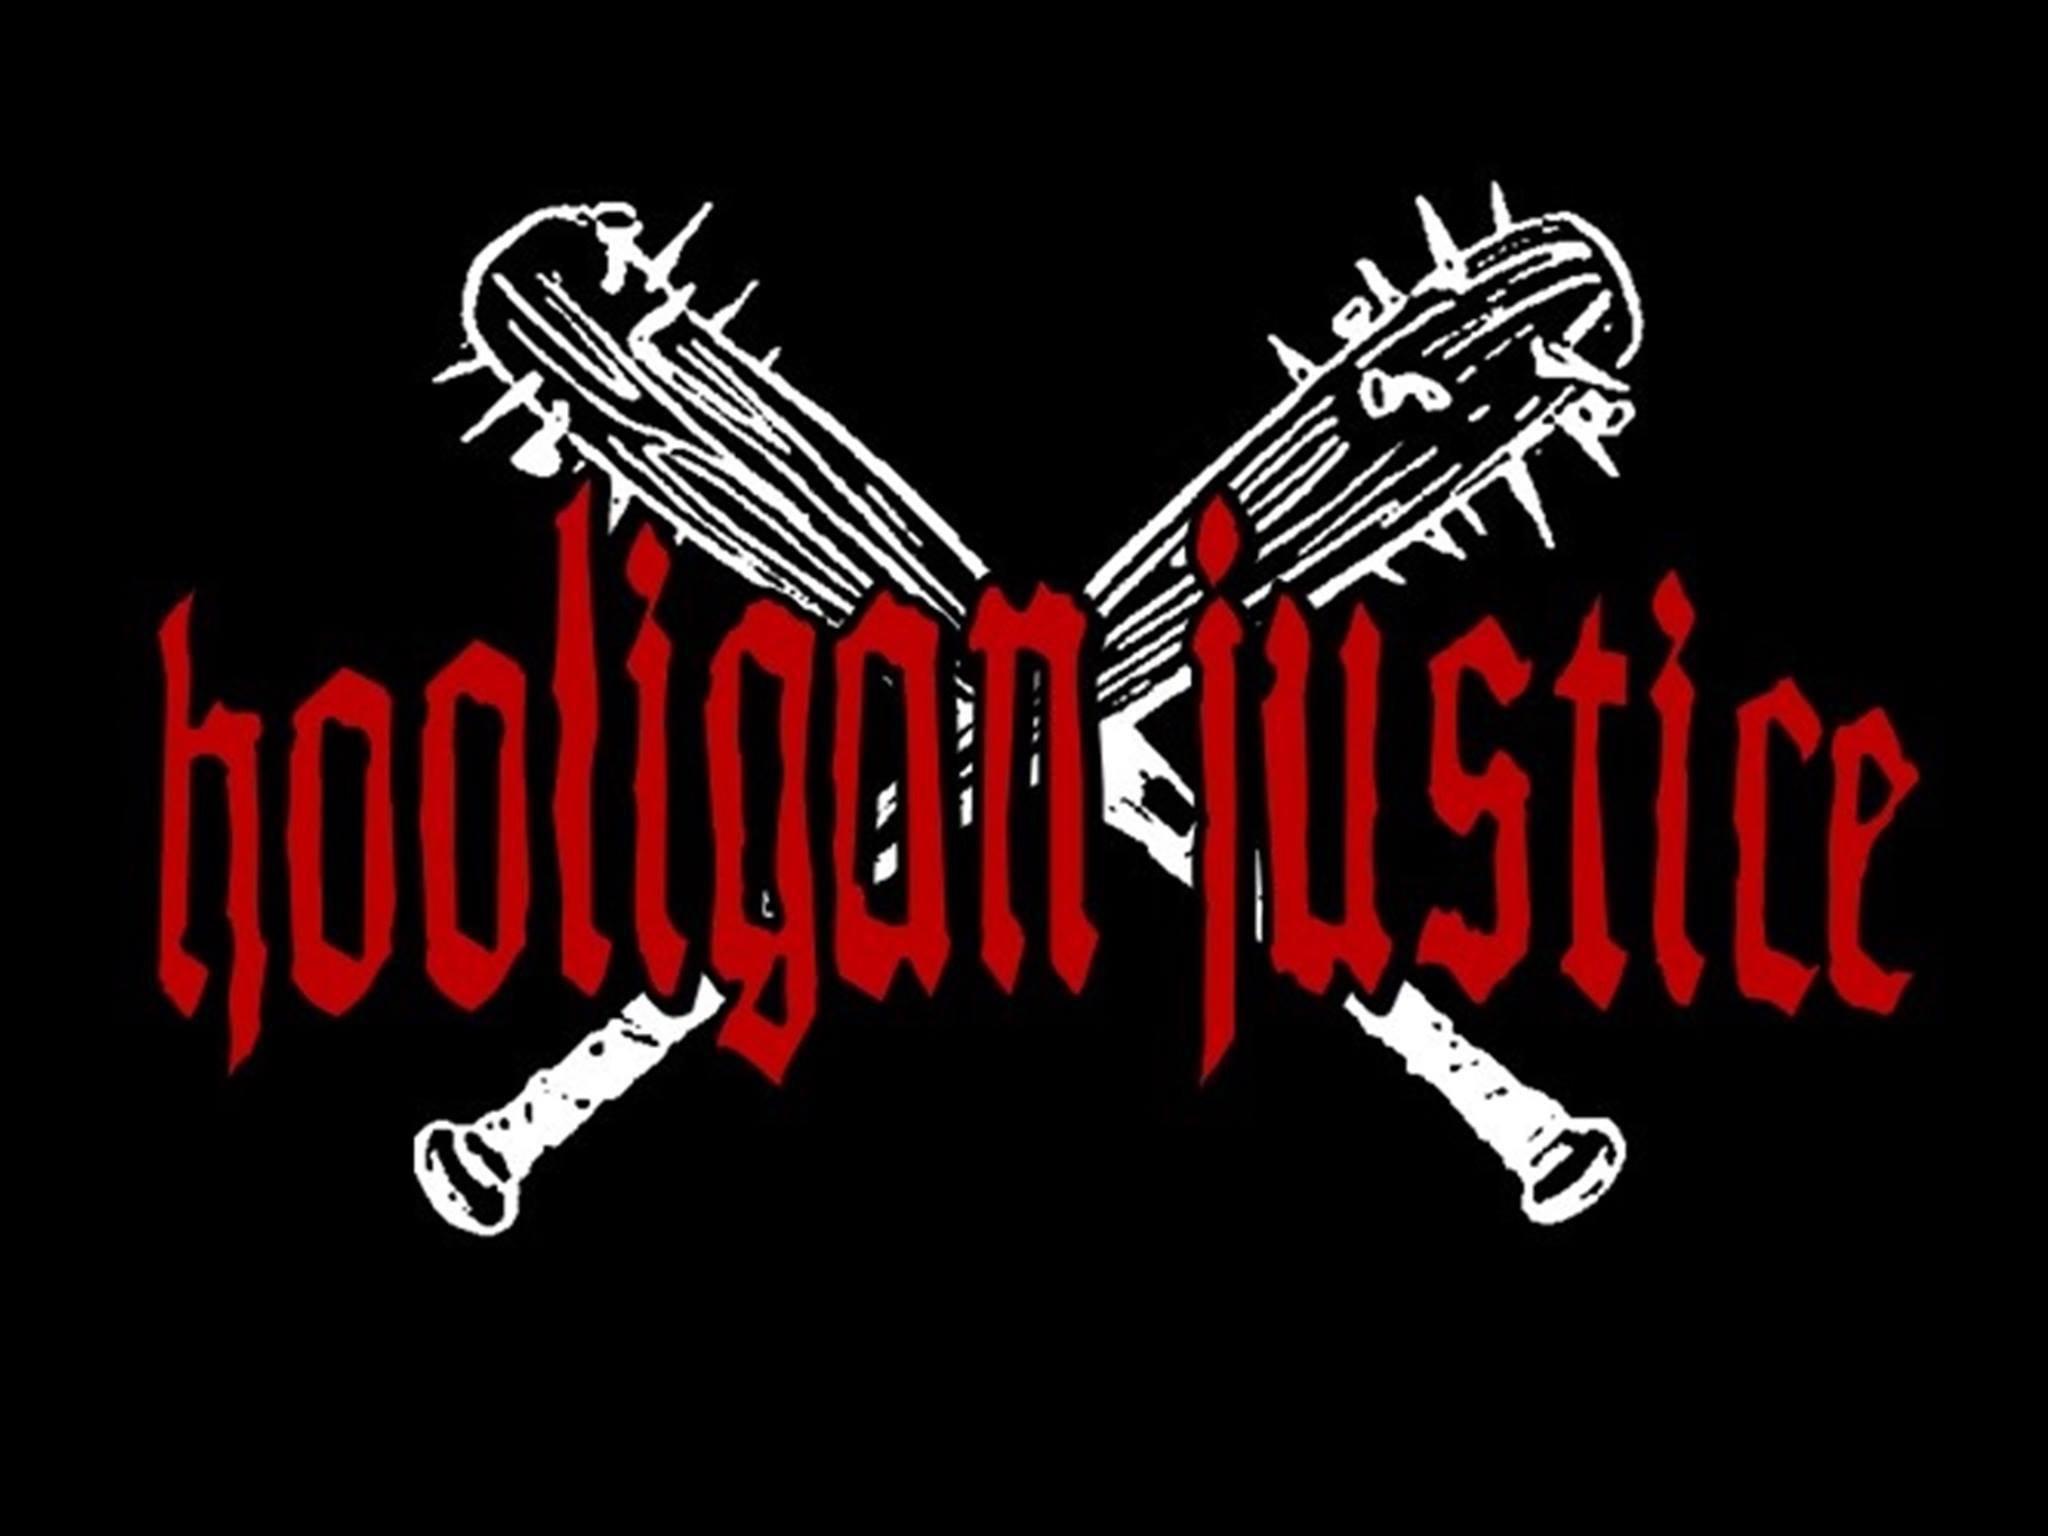 Image for Hooligan Justice